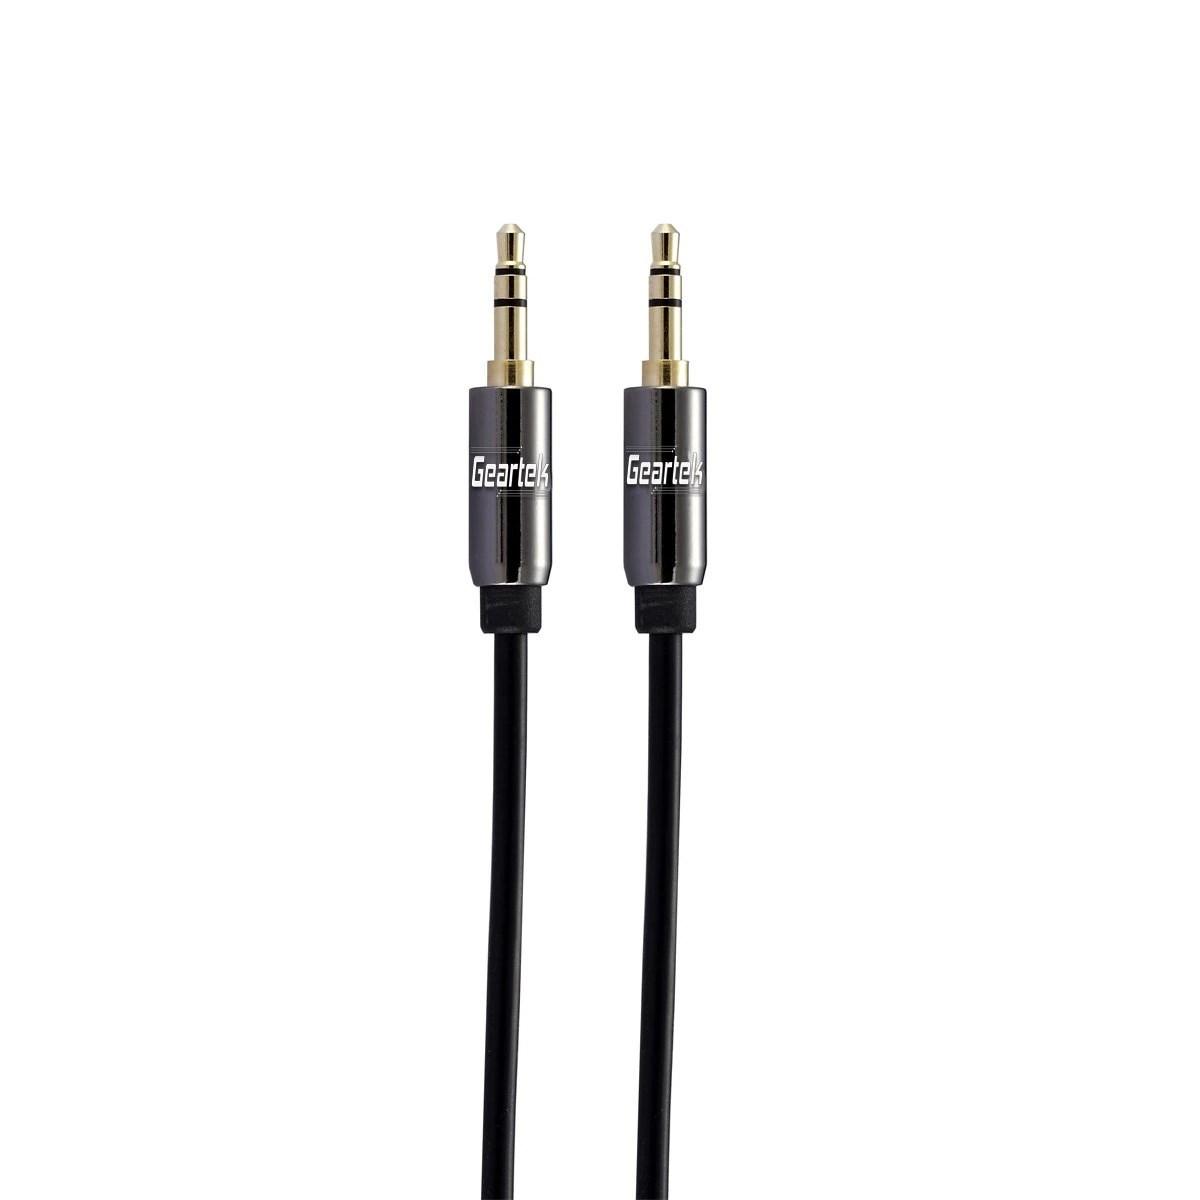 Cable De Audio Premium Plug 3 5mm Geartek